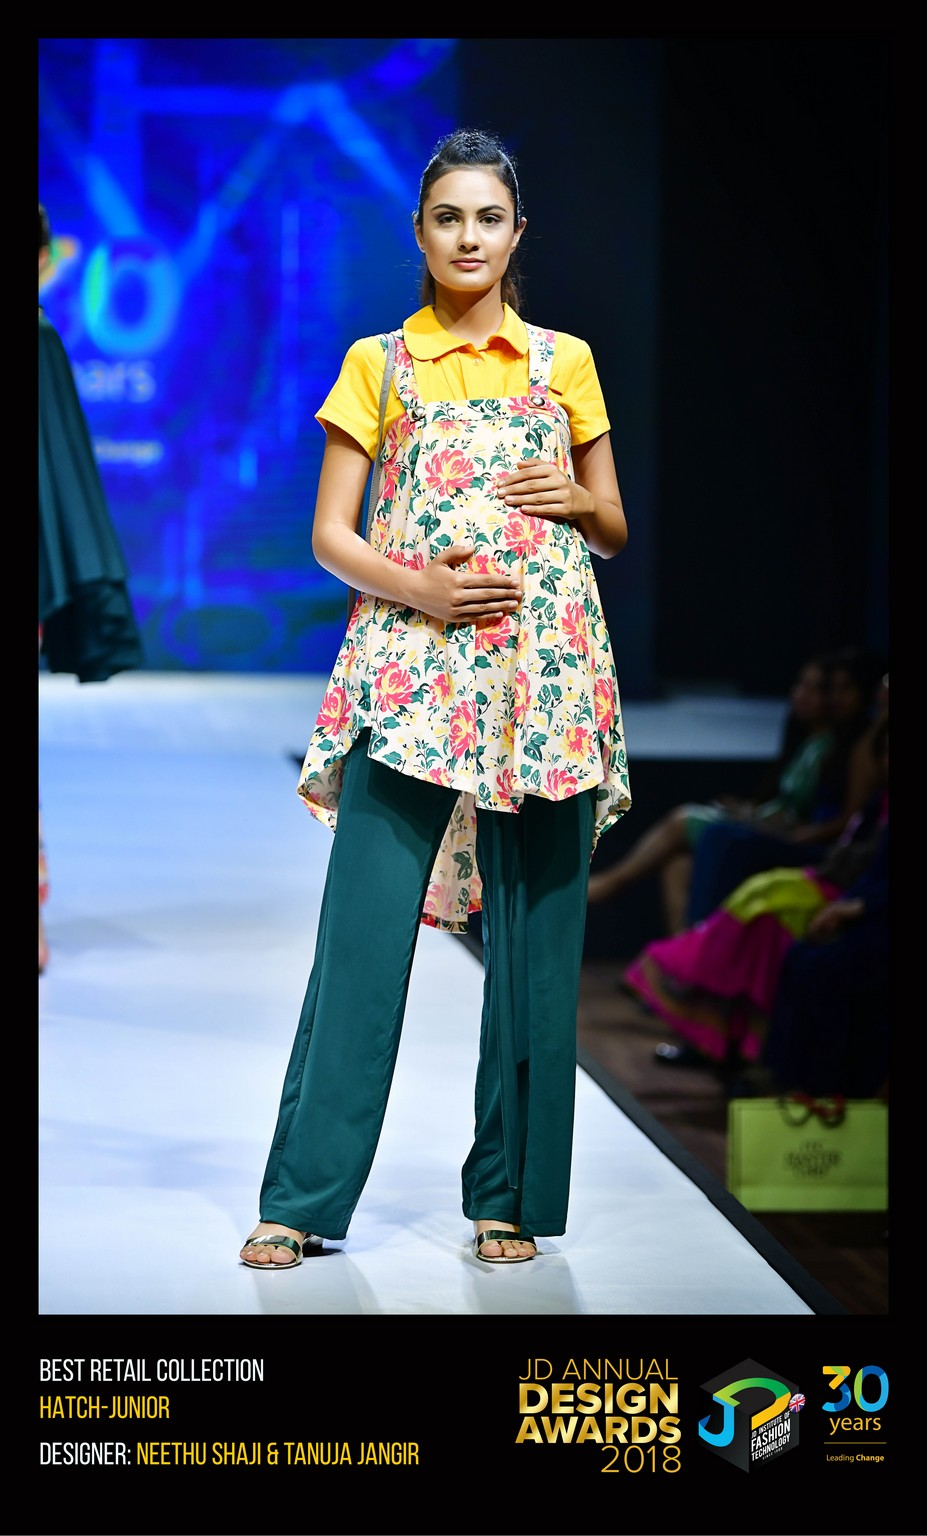 Hatch: Junior on Board – Change – JD Annual Design Awards 2018 | Designer: Neethu Shaji and Tanuja Jangir | Photography : Jerin Nath (@jerin_nath) hatch Hatch: Junior on Board – Change – JD Annual Design Awards 2018 HATCH JUNIOR5